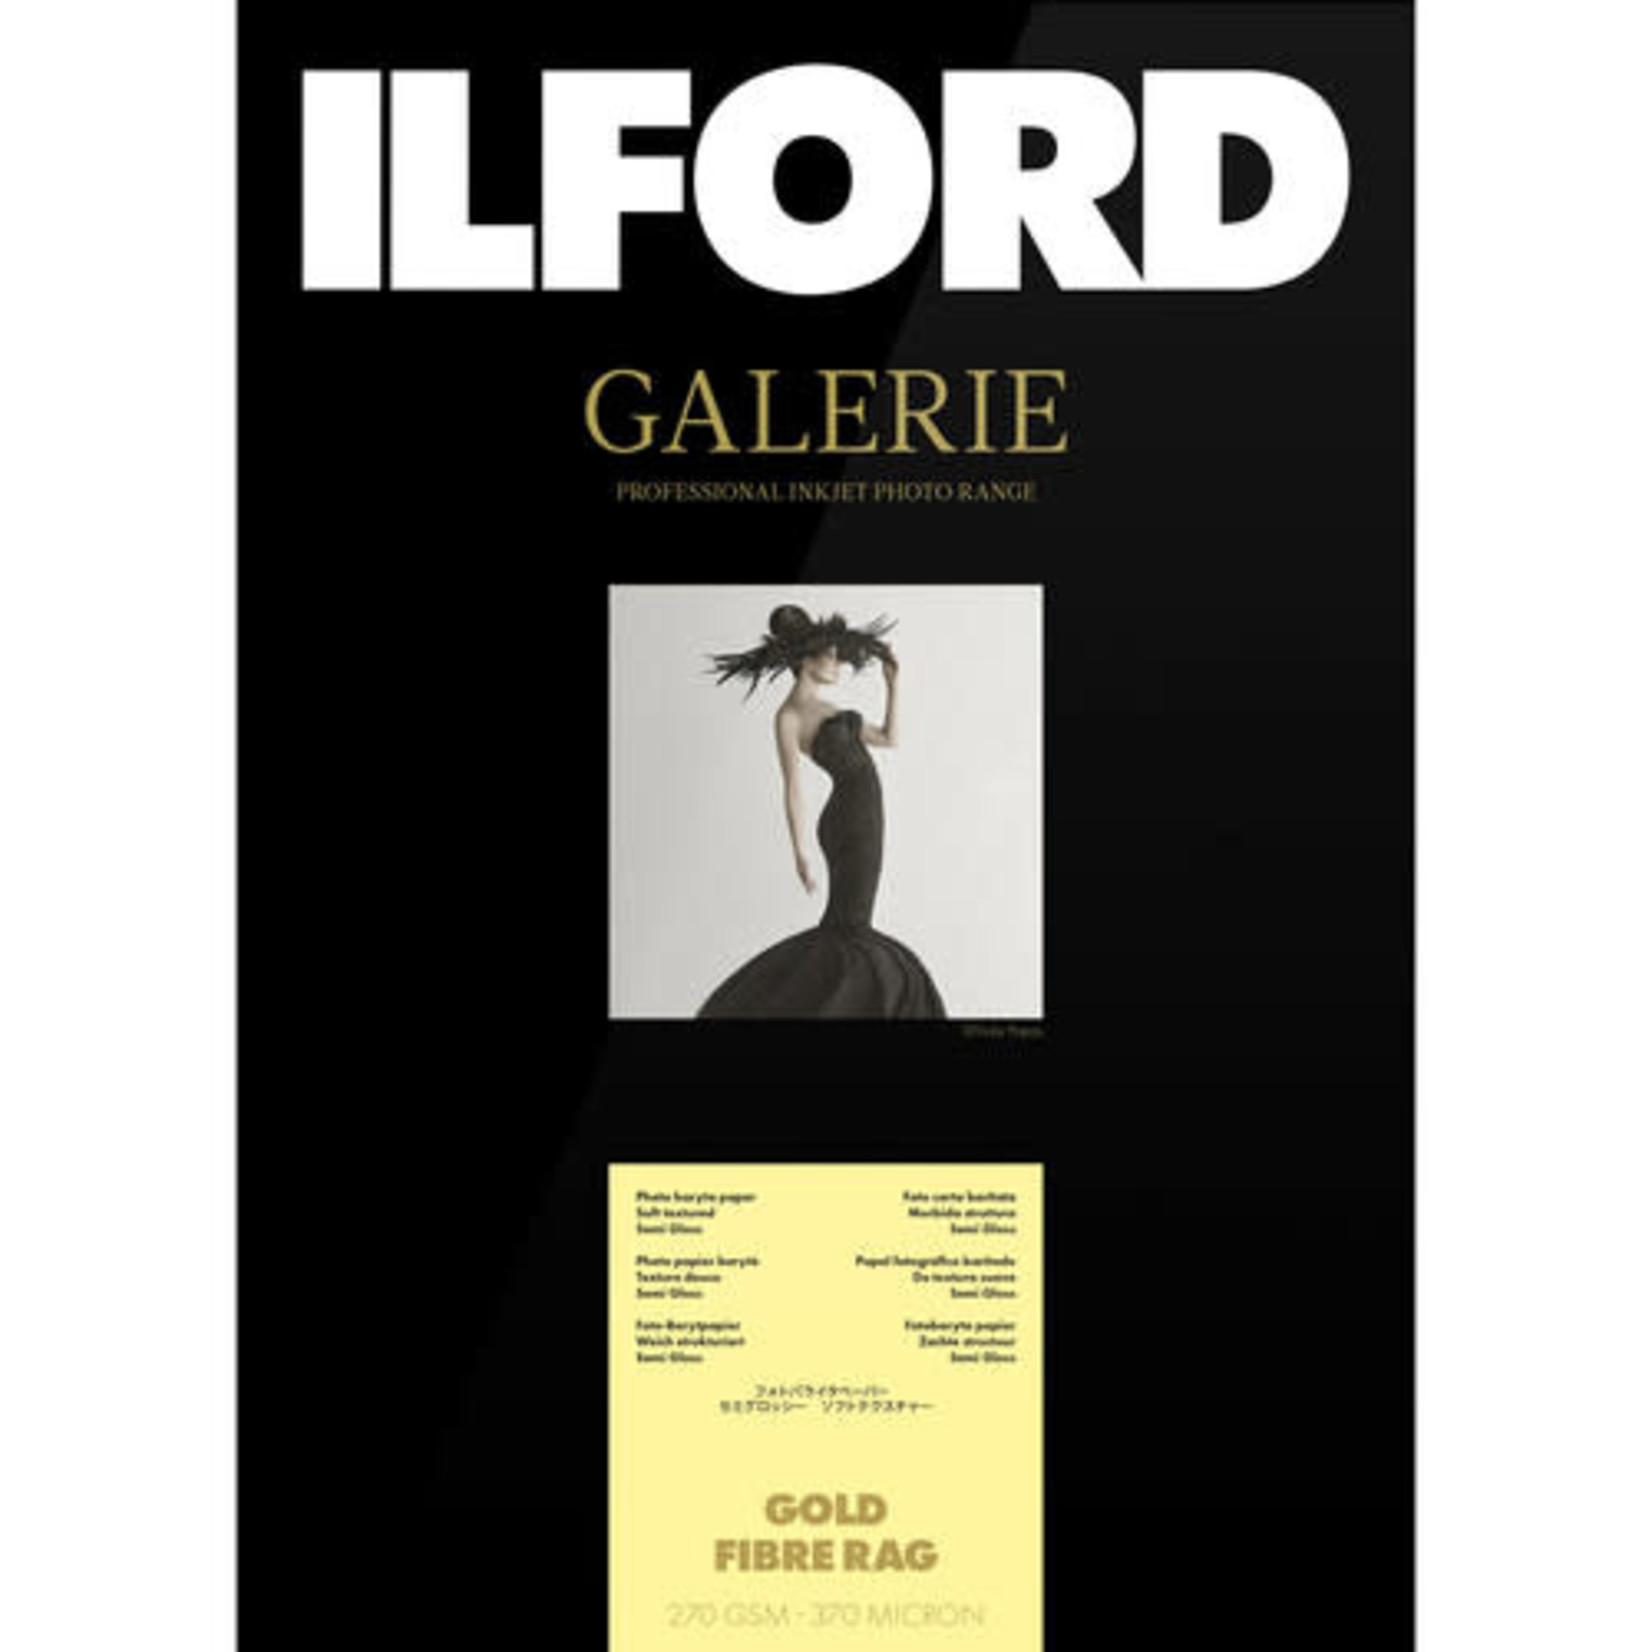 Ilford Galerie Gold Fibre Rag 8.5x11 (25 PK)